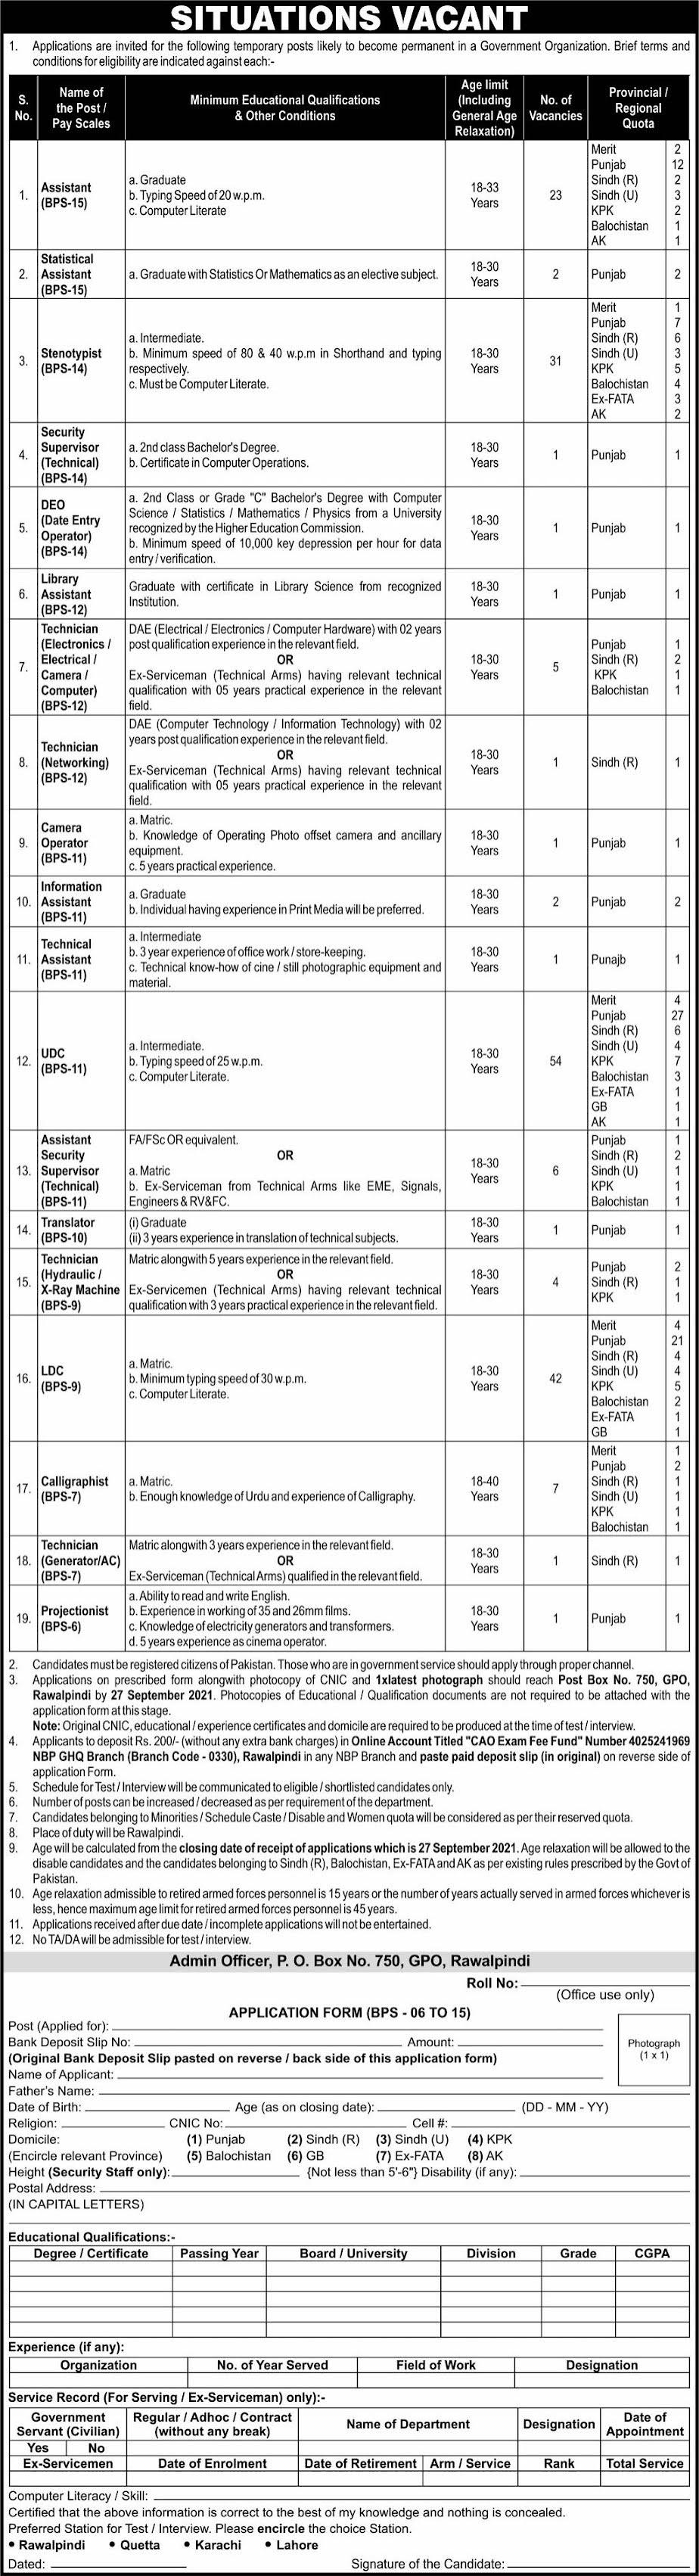 Government Organization Public Sector Organization P.O. Box No. 750 GPO Rawalpindi Jobs 2021